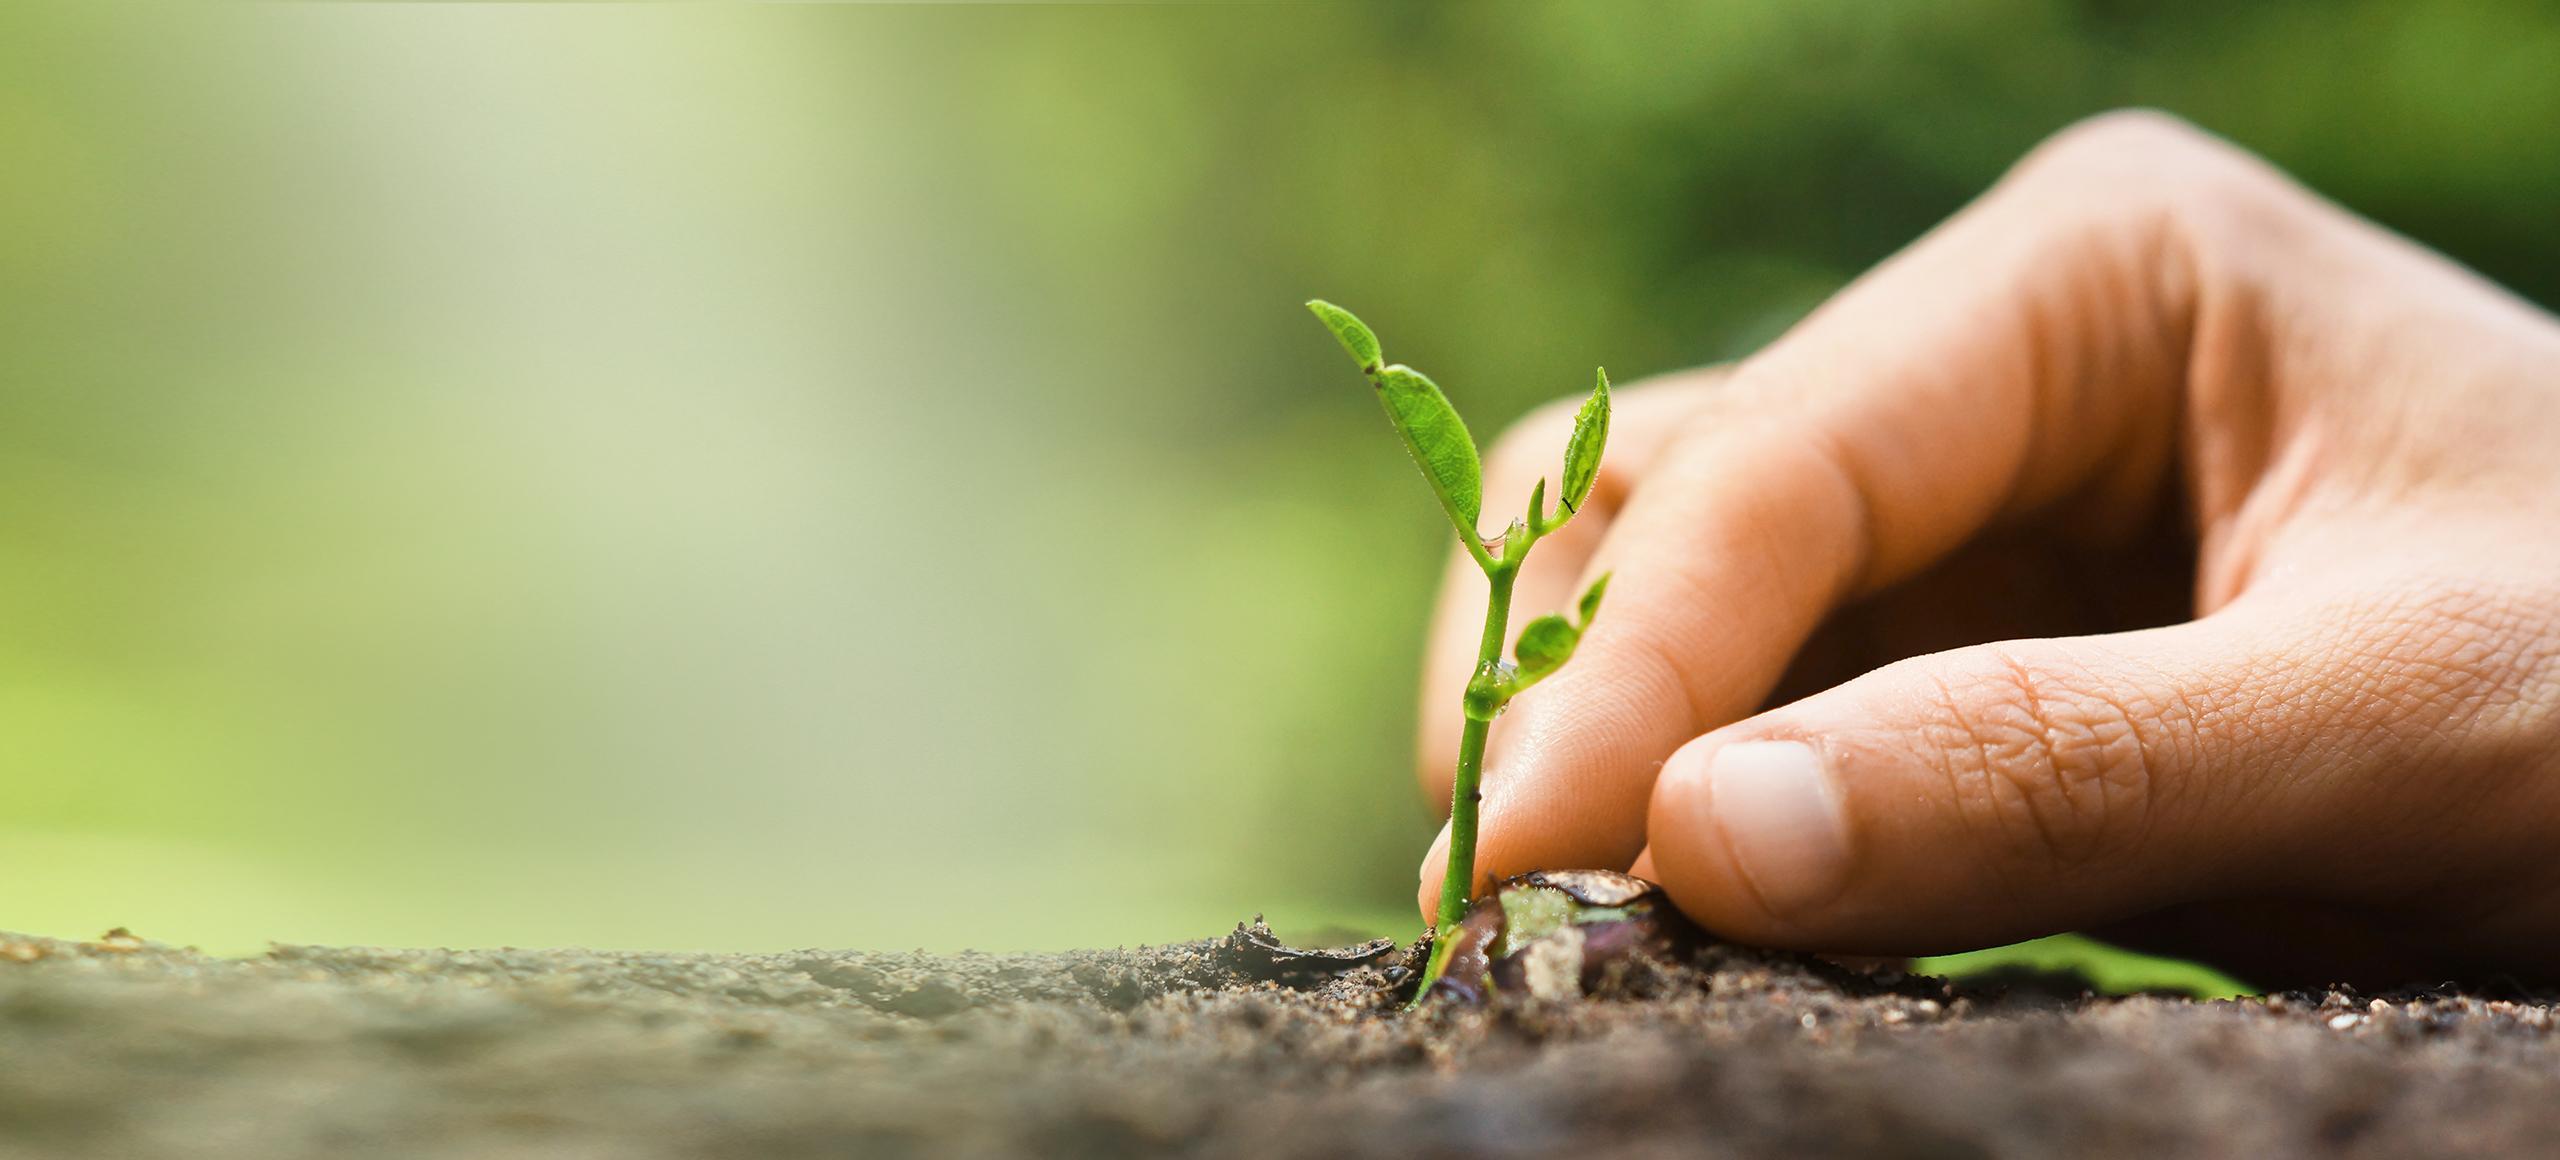 BRITA Rücksendungen und Recycling Hand Pflanze